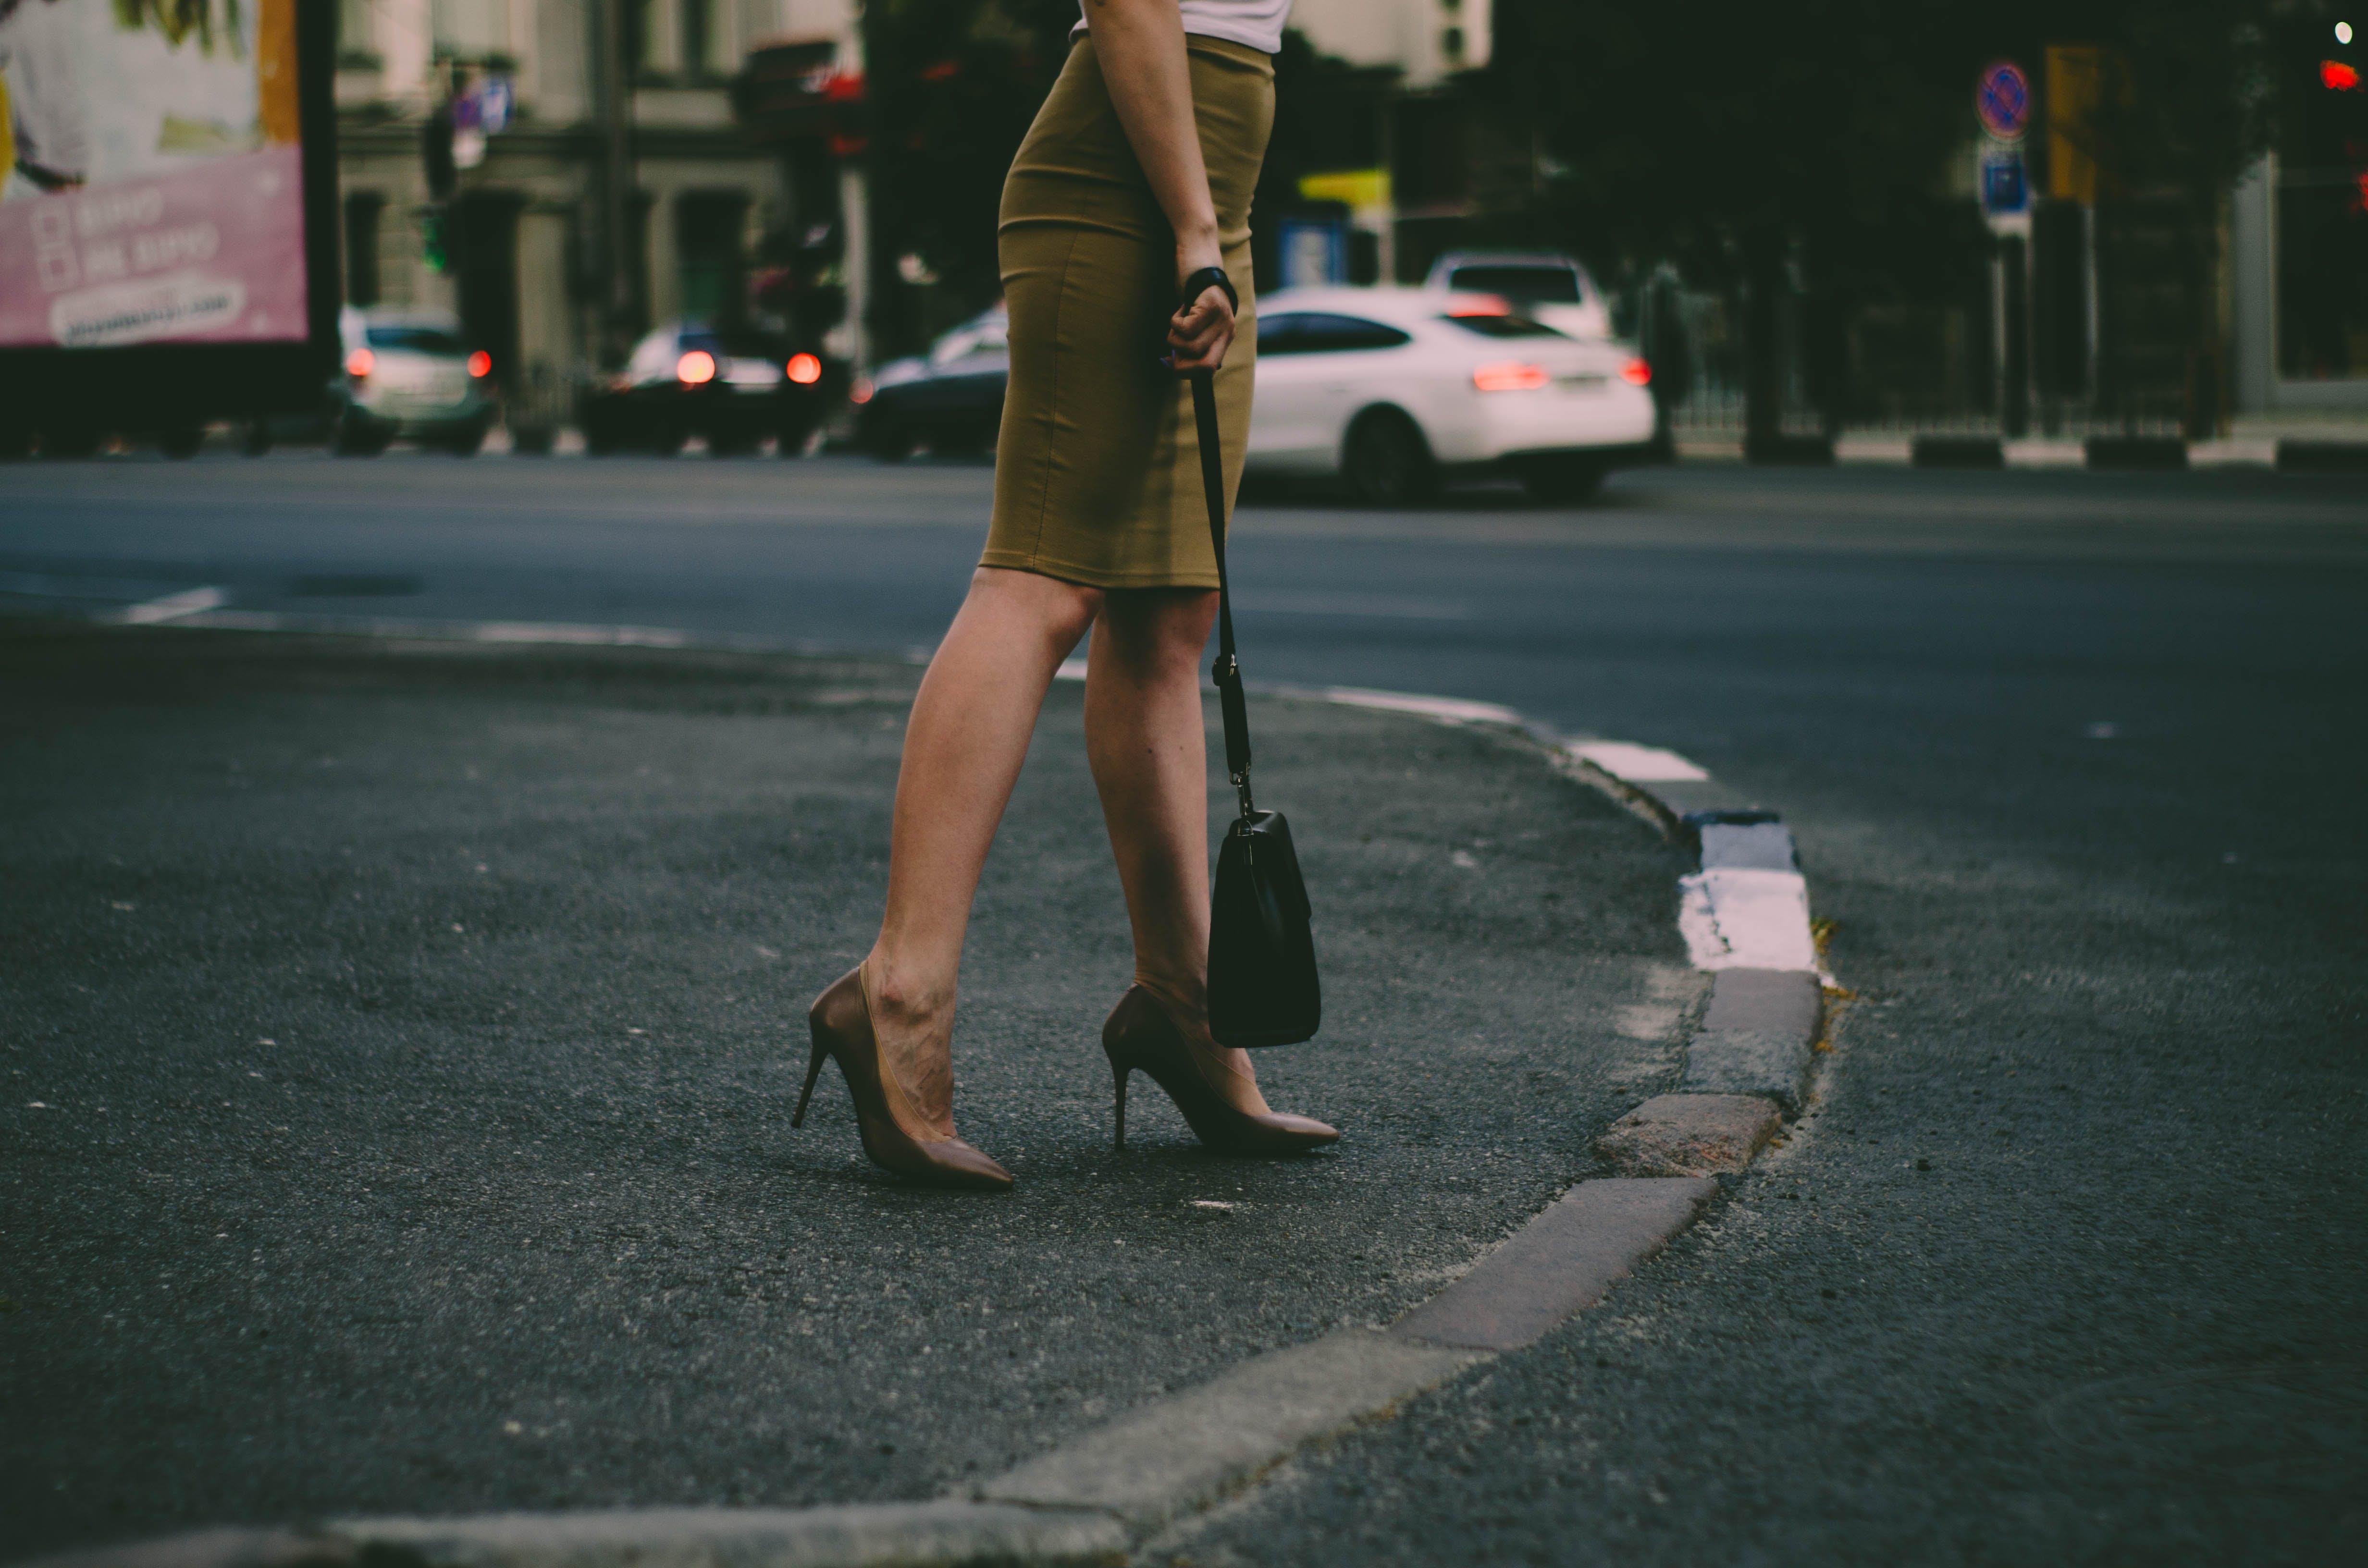 Woman's Holding Black Sling Bag